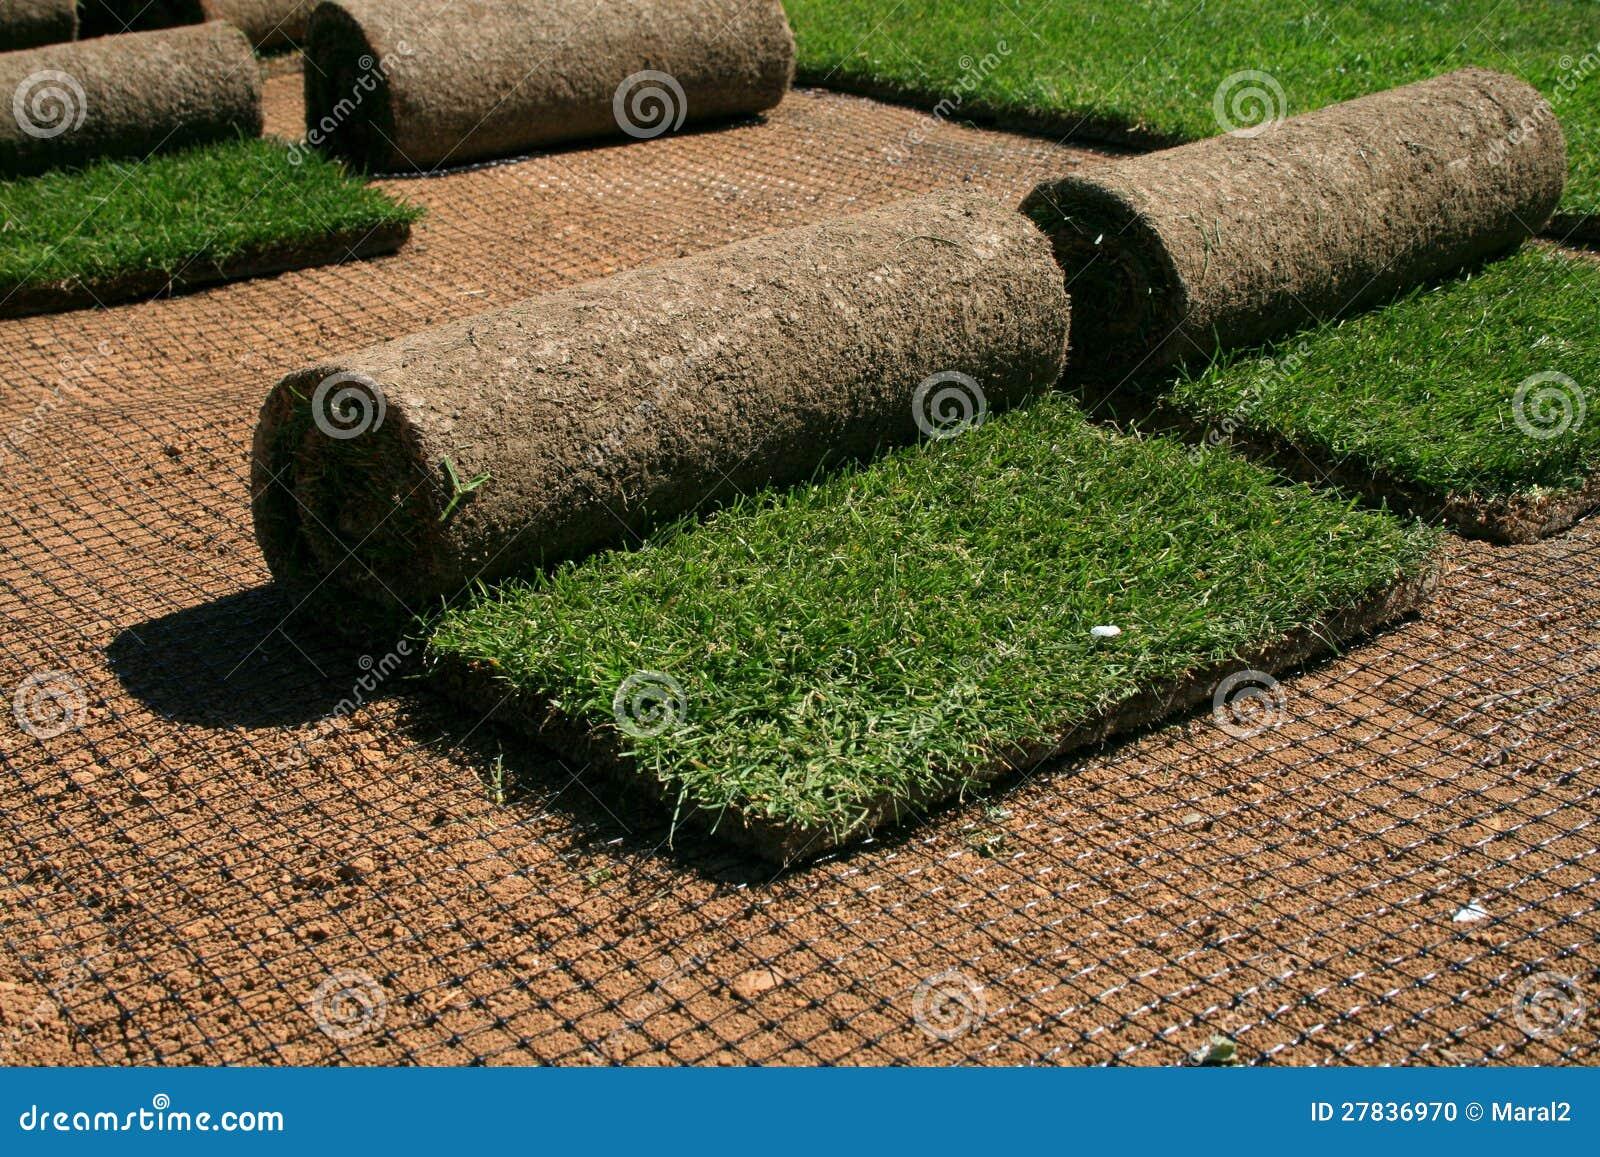 Carpet Grass Stock Photo Image 27836970